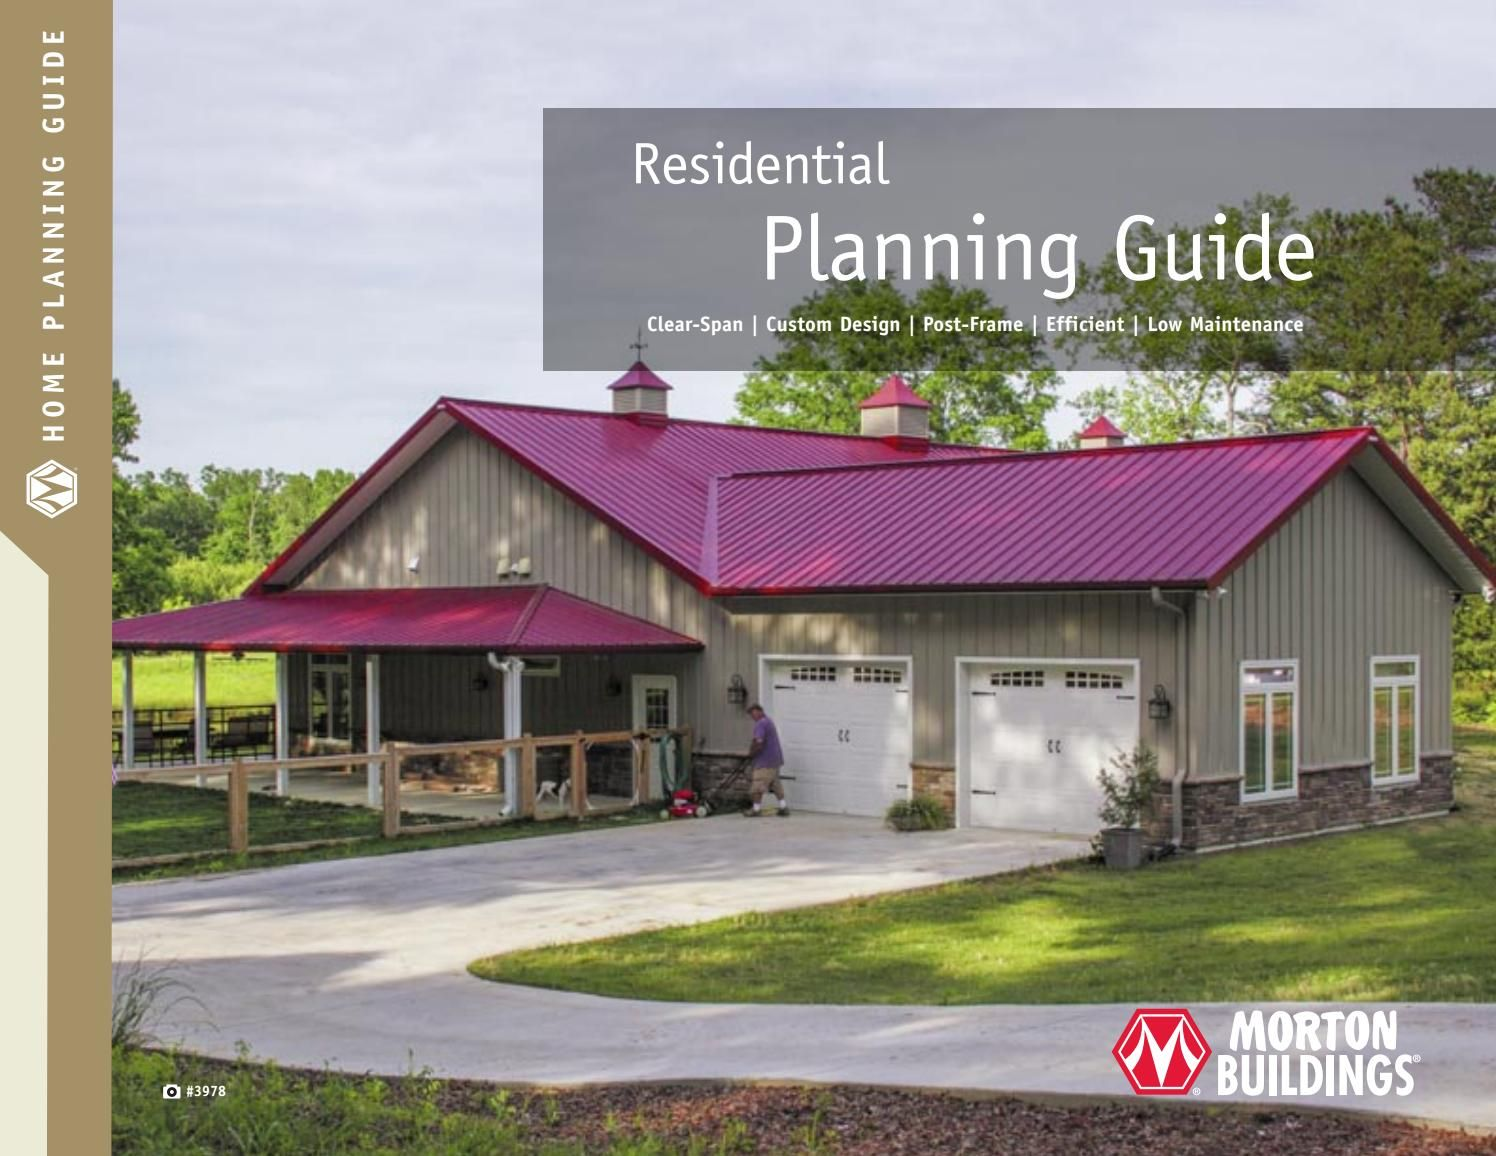 Morton Buildings Residential Planning Guide Morton Buildings